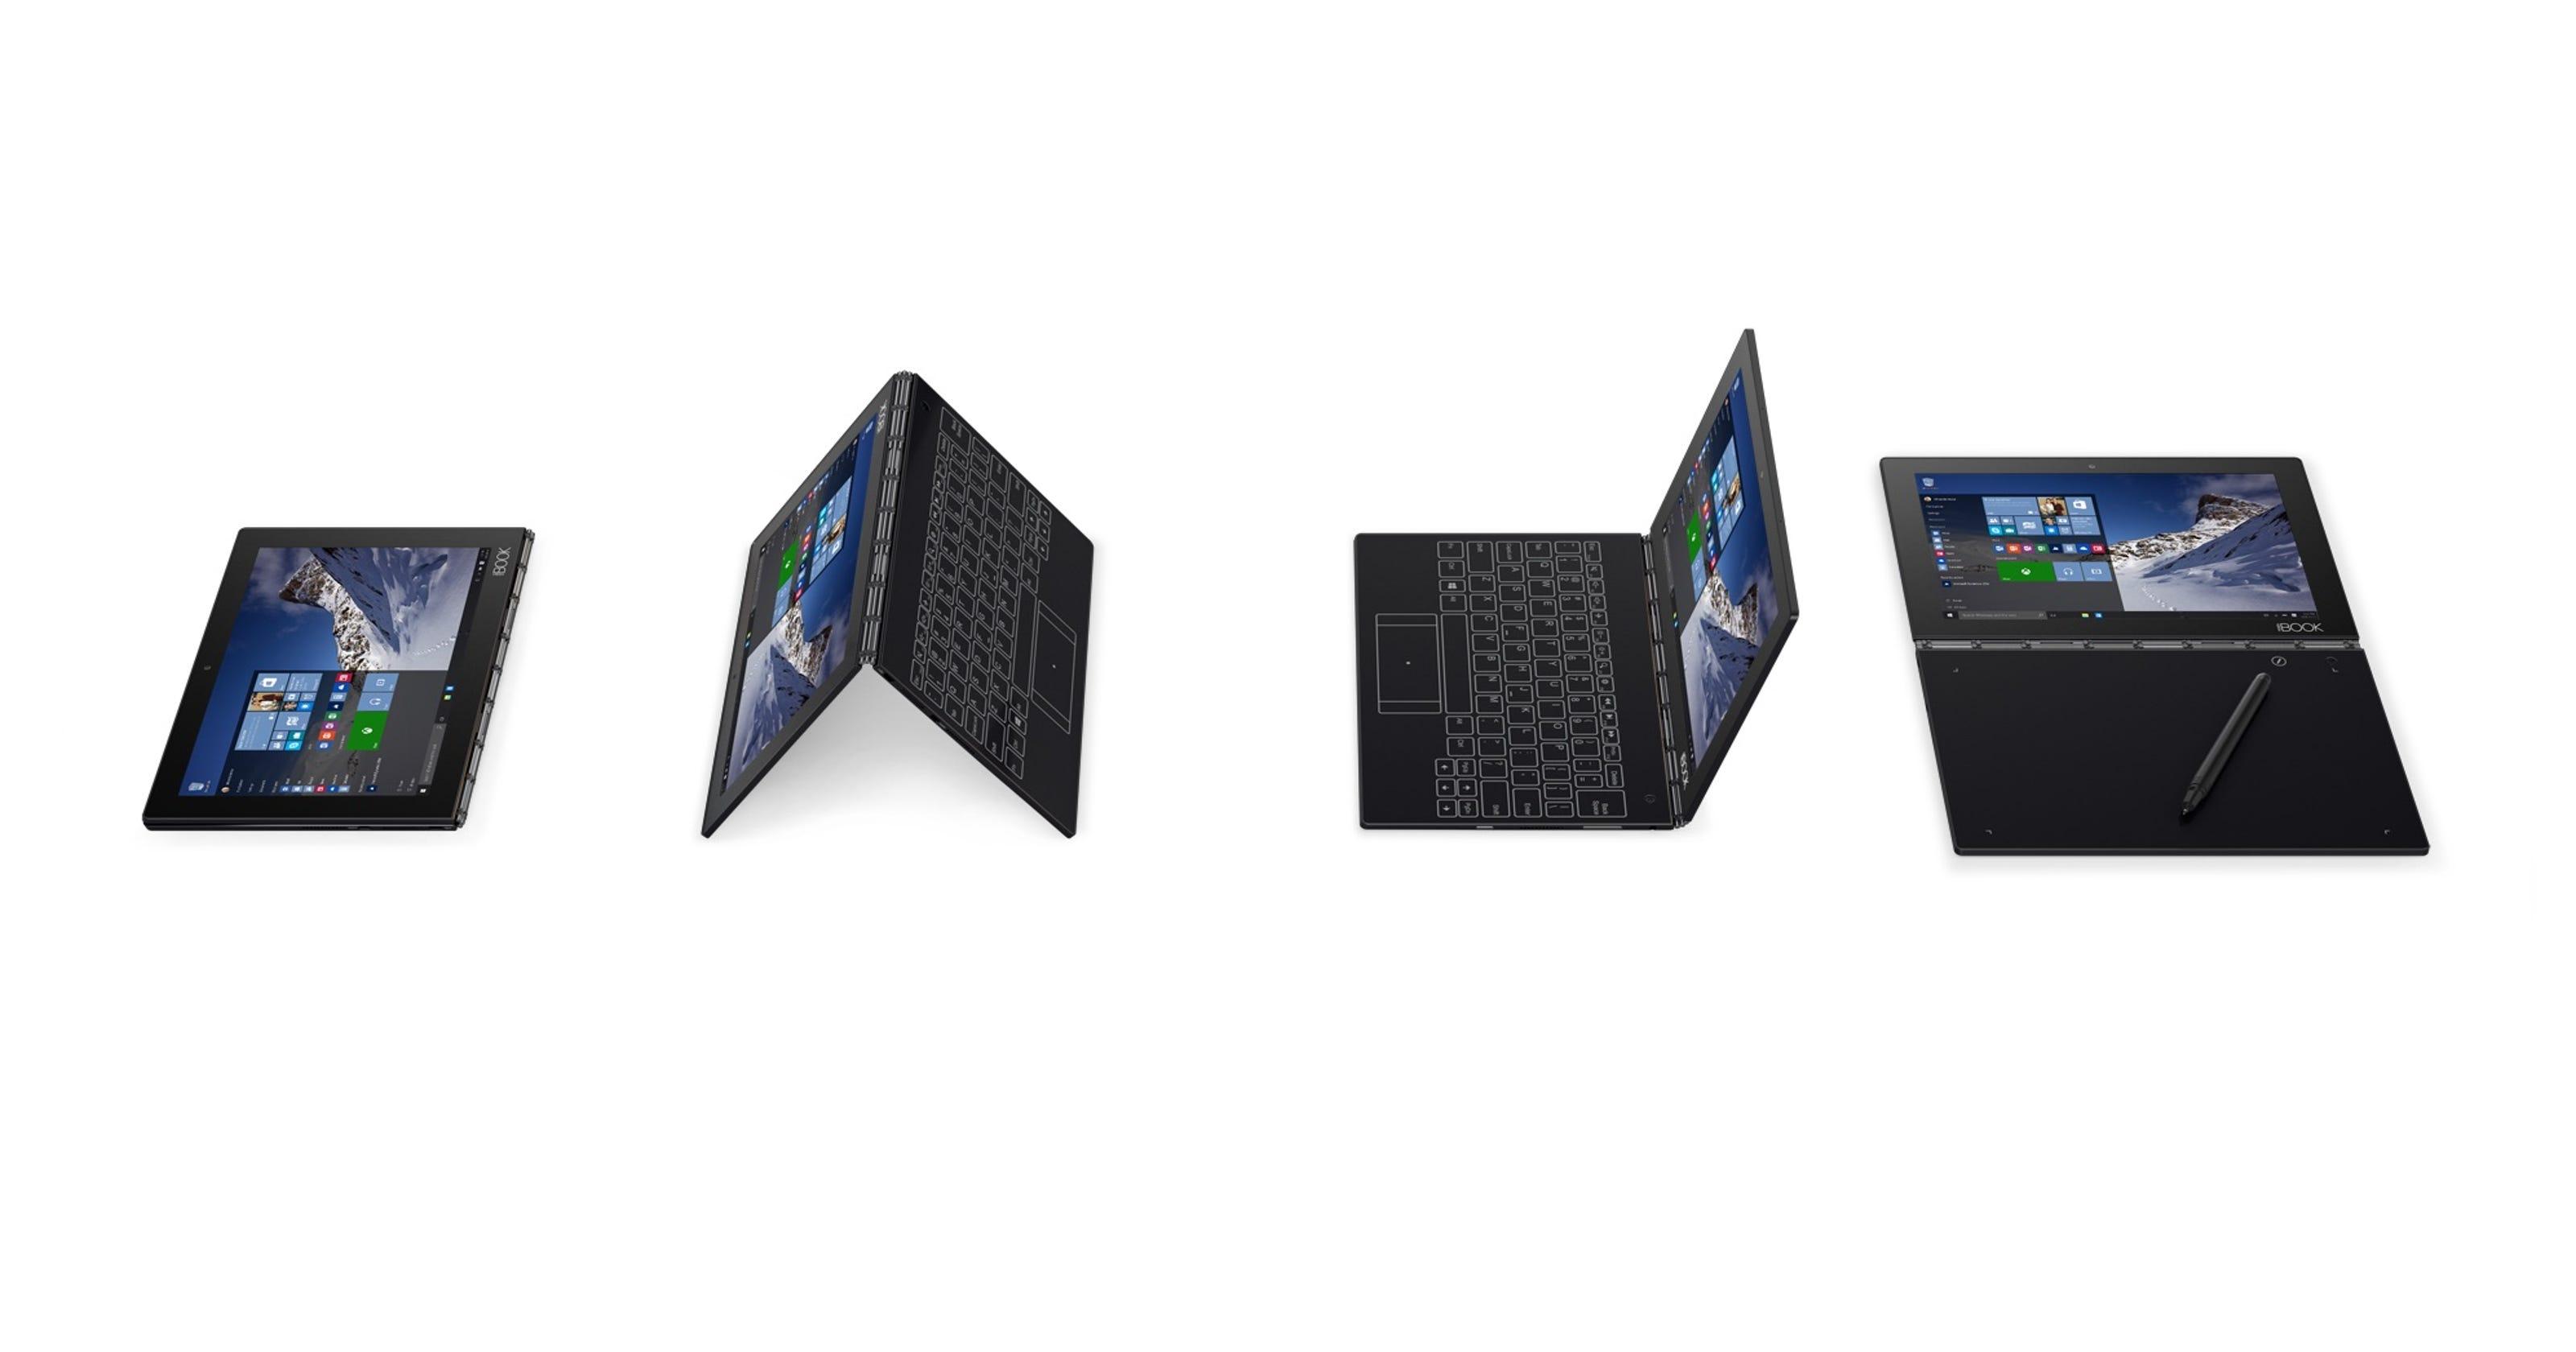 Lenovo Yoga Book tablet: innovative but unsatisfying